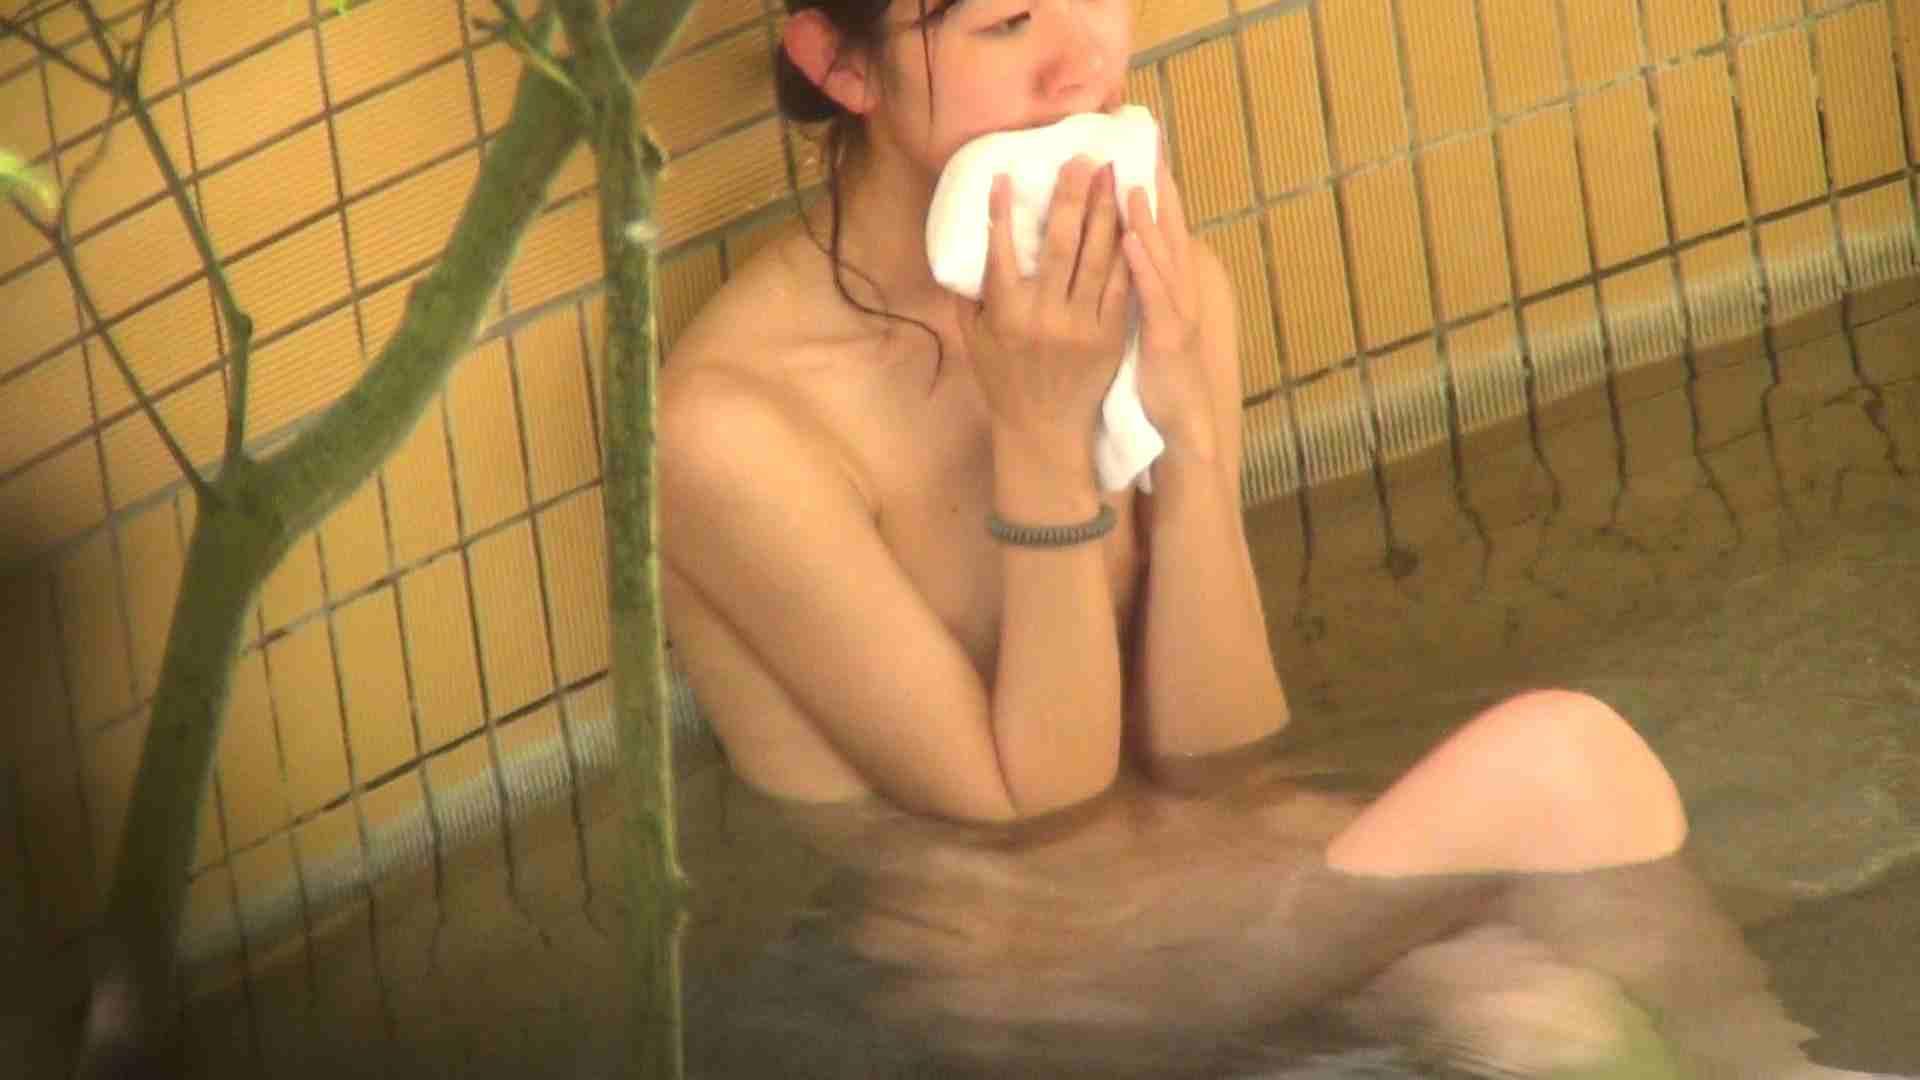 Vol.77 お上品な貧乳色白お女市さまの裸を見る醍醐味 美女 覗きオメコ動画キャプチャ 76pic 70